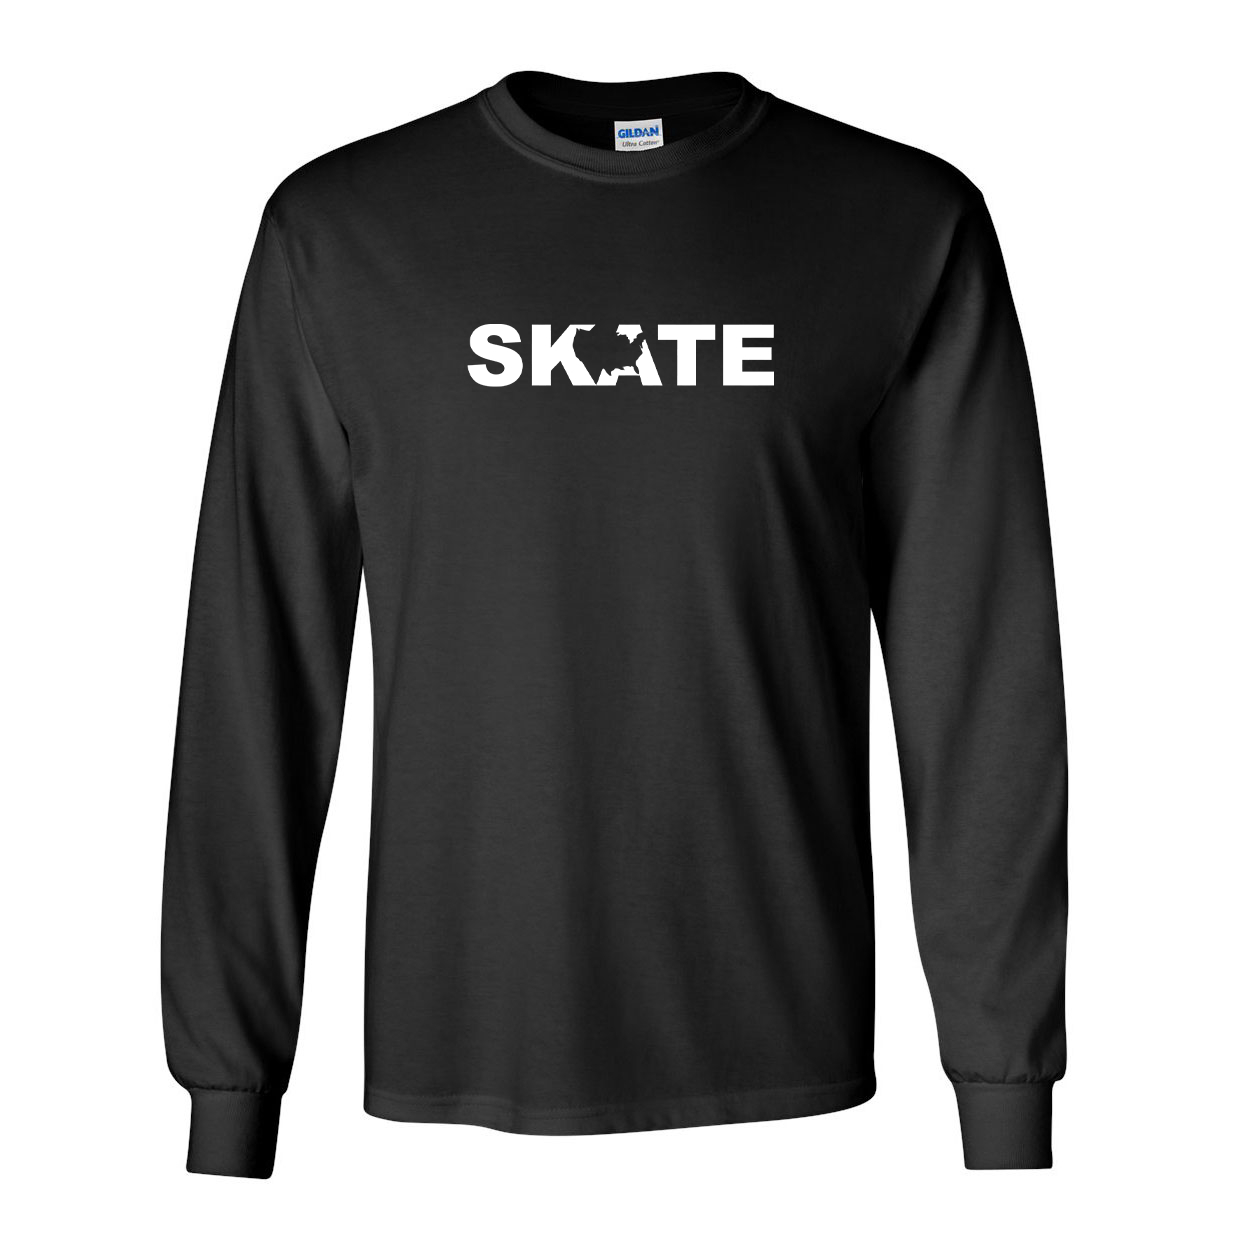 Skate United States Classic Long Sleeve T-Shirt Black (White Logo)